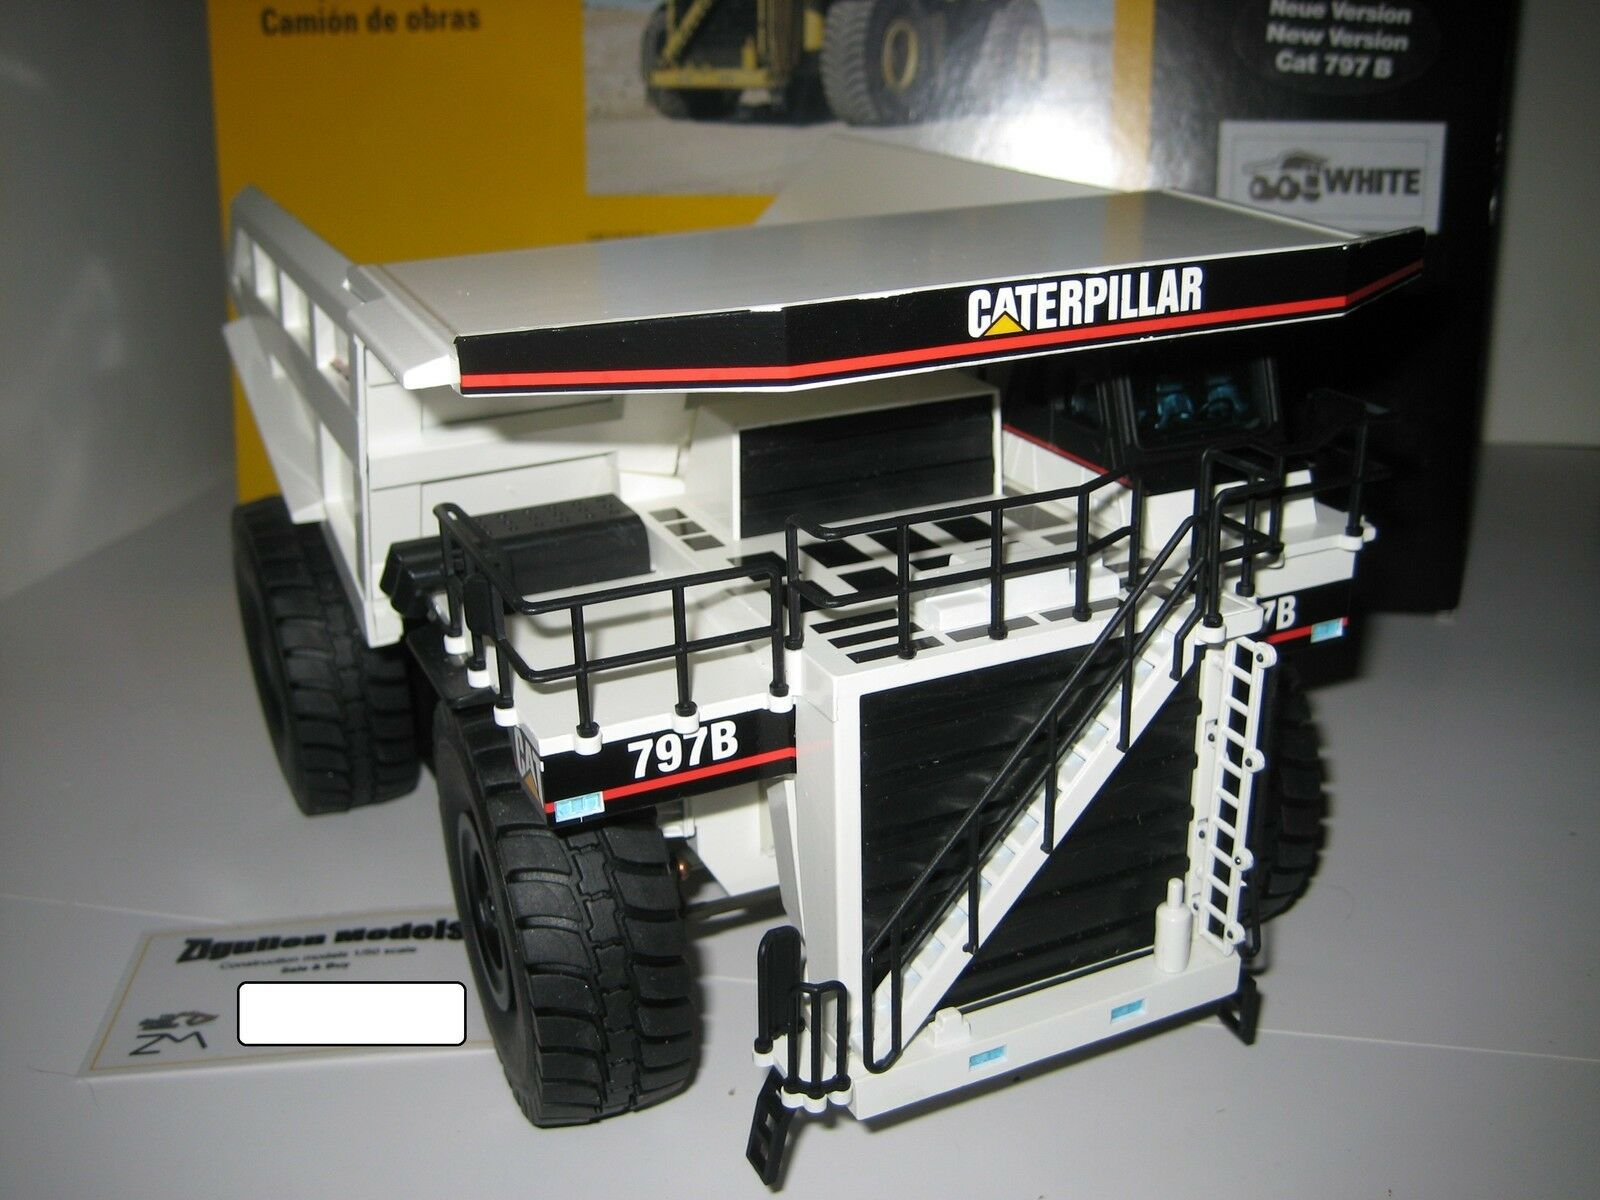 Caterpillar 797 B benne BIANCO #519.2 NZG 1:50 OVP